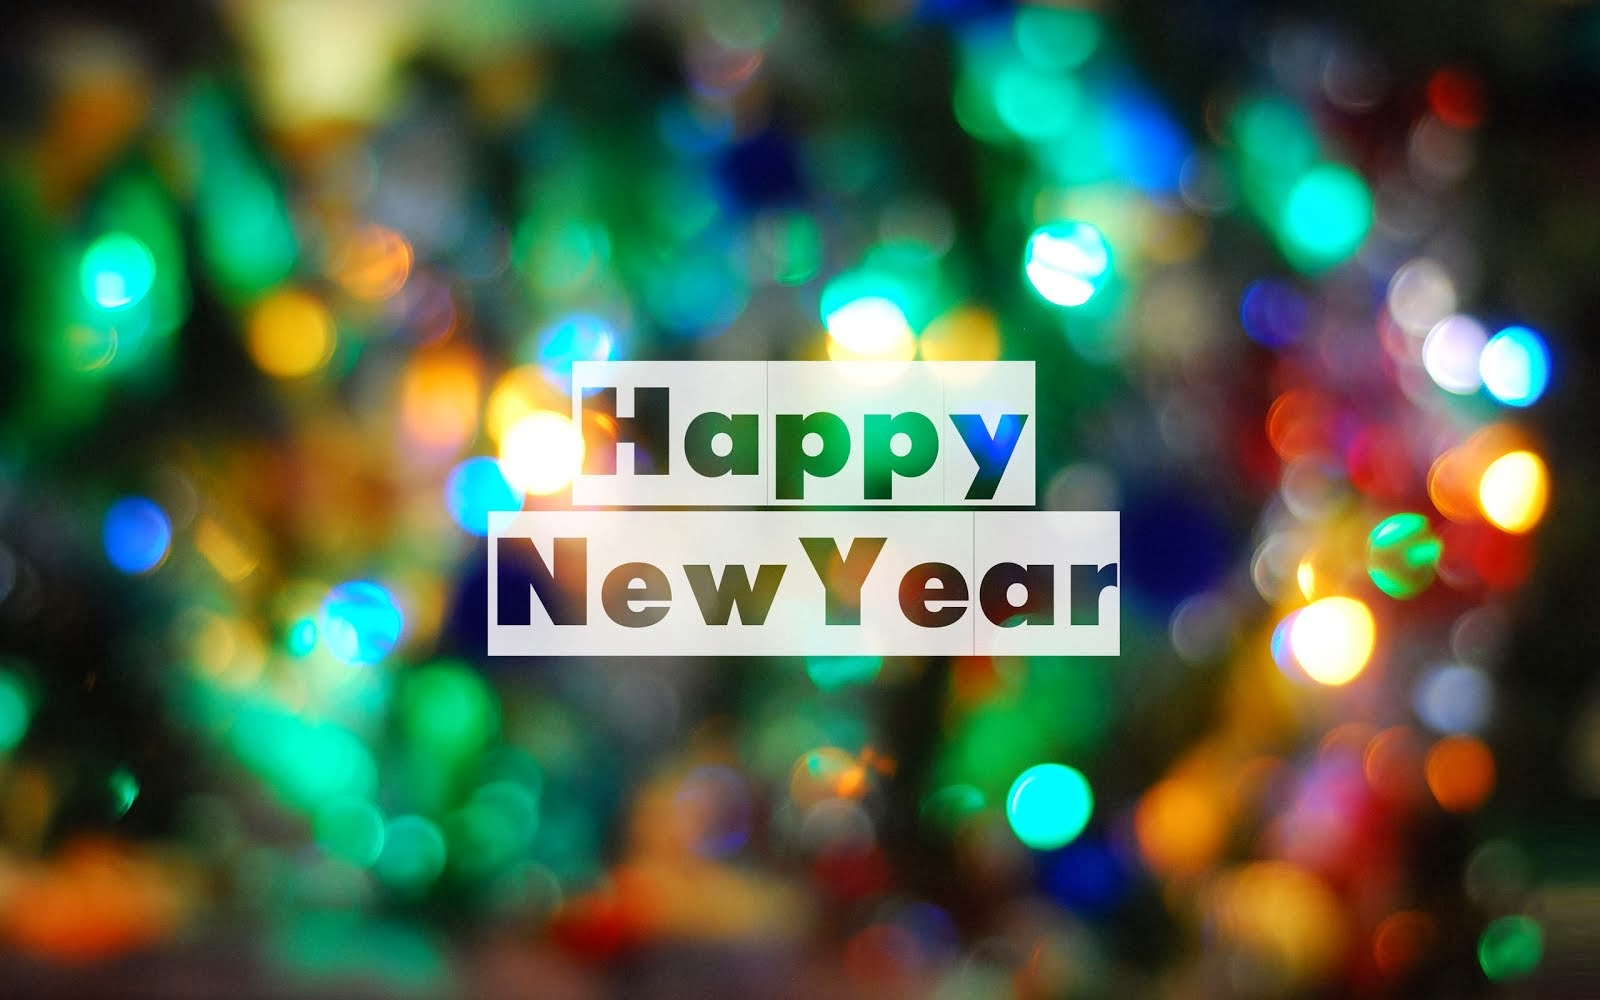 Happy New Year Wallpaper 01 1600x1000